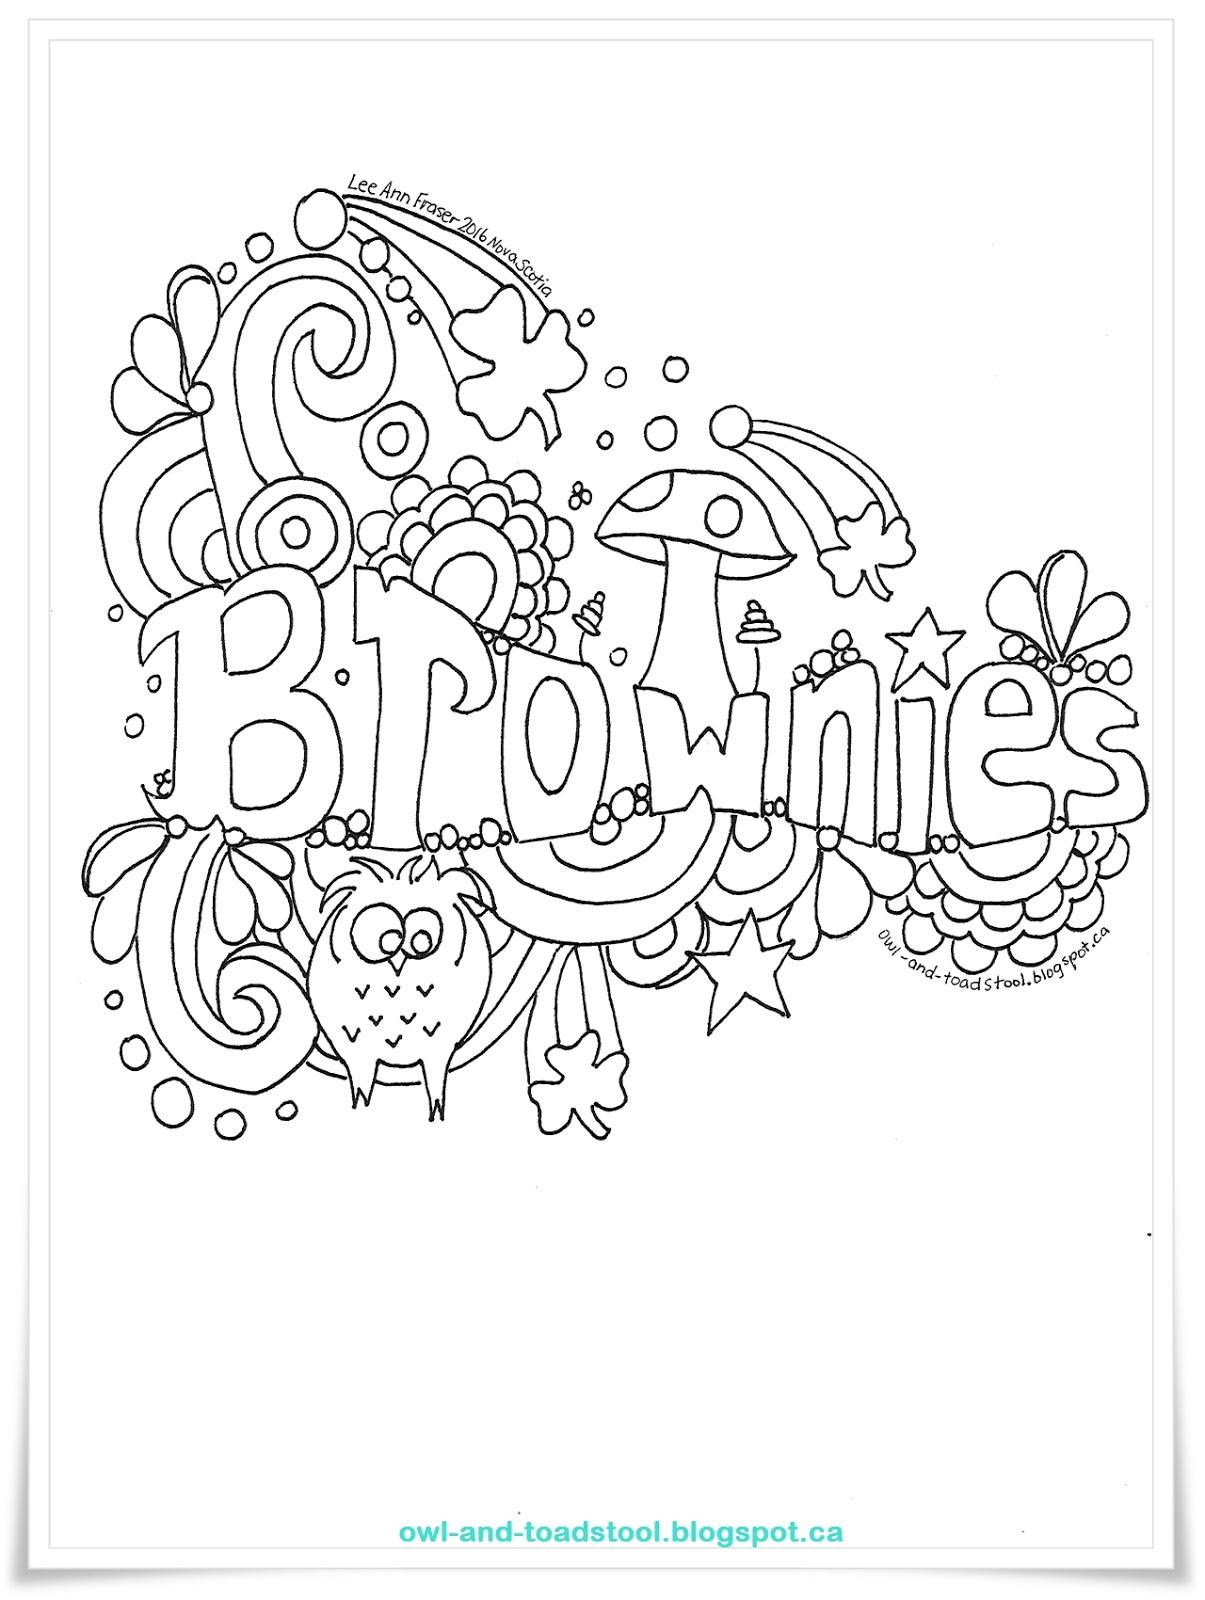 brownie coloring pages printable owl toadstool doodle brownies pages printable brownie coloring